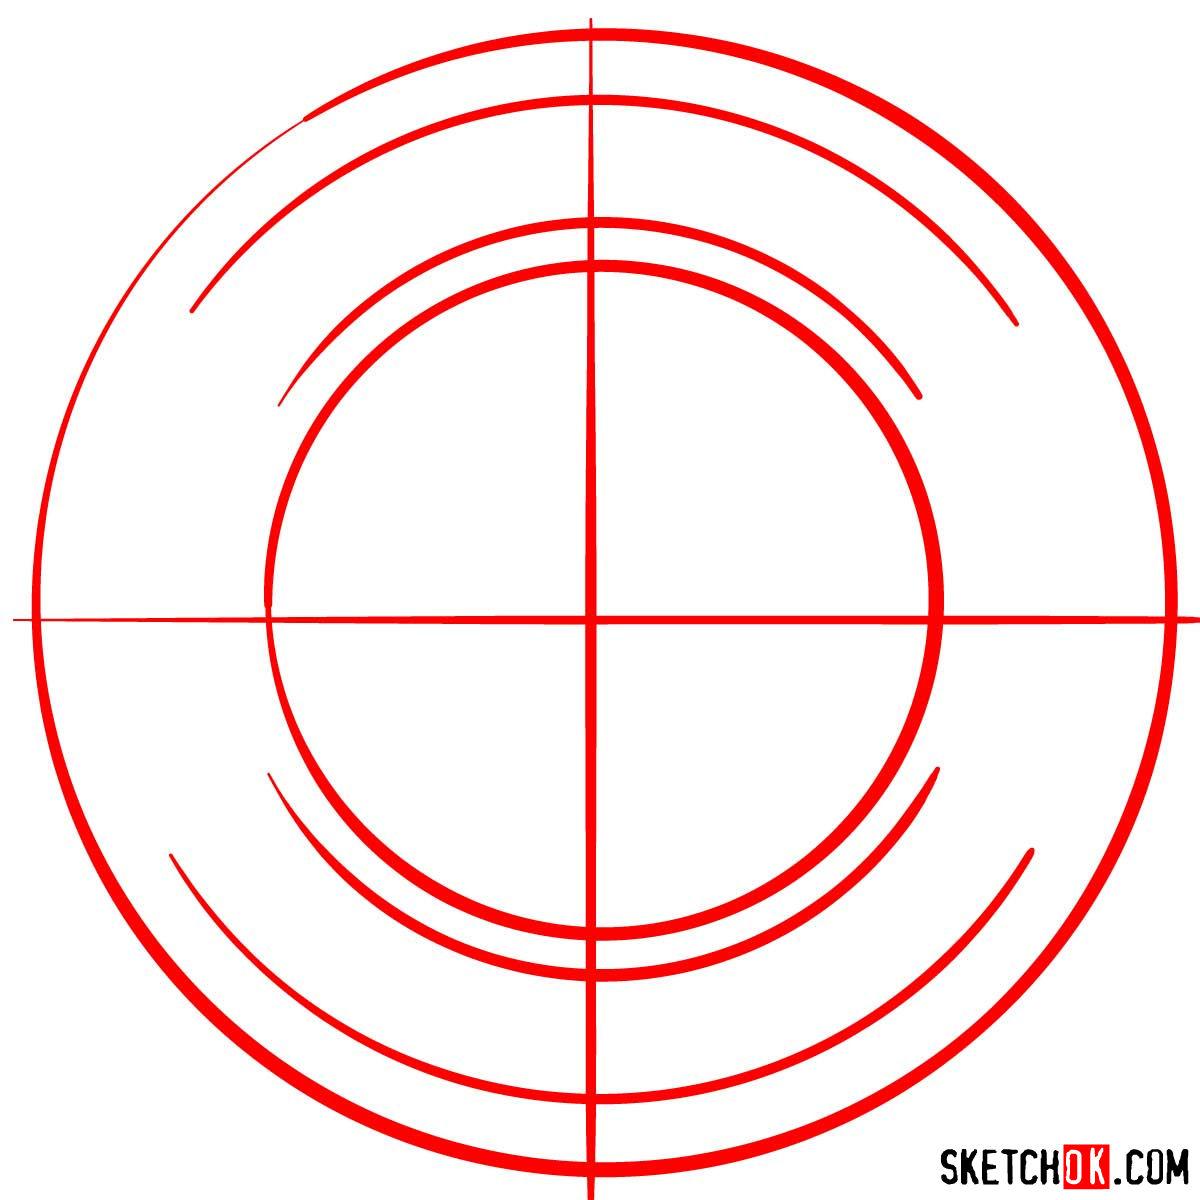 How to draw Oakland Athletics logo | MLB logos - step 01